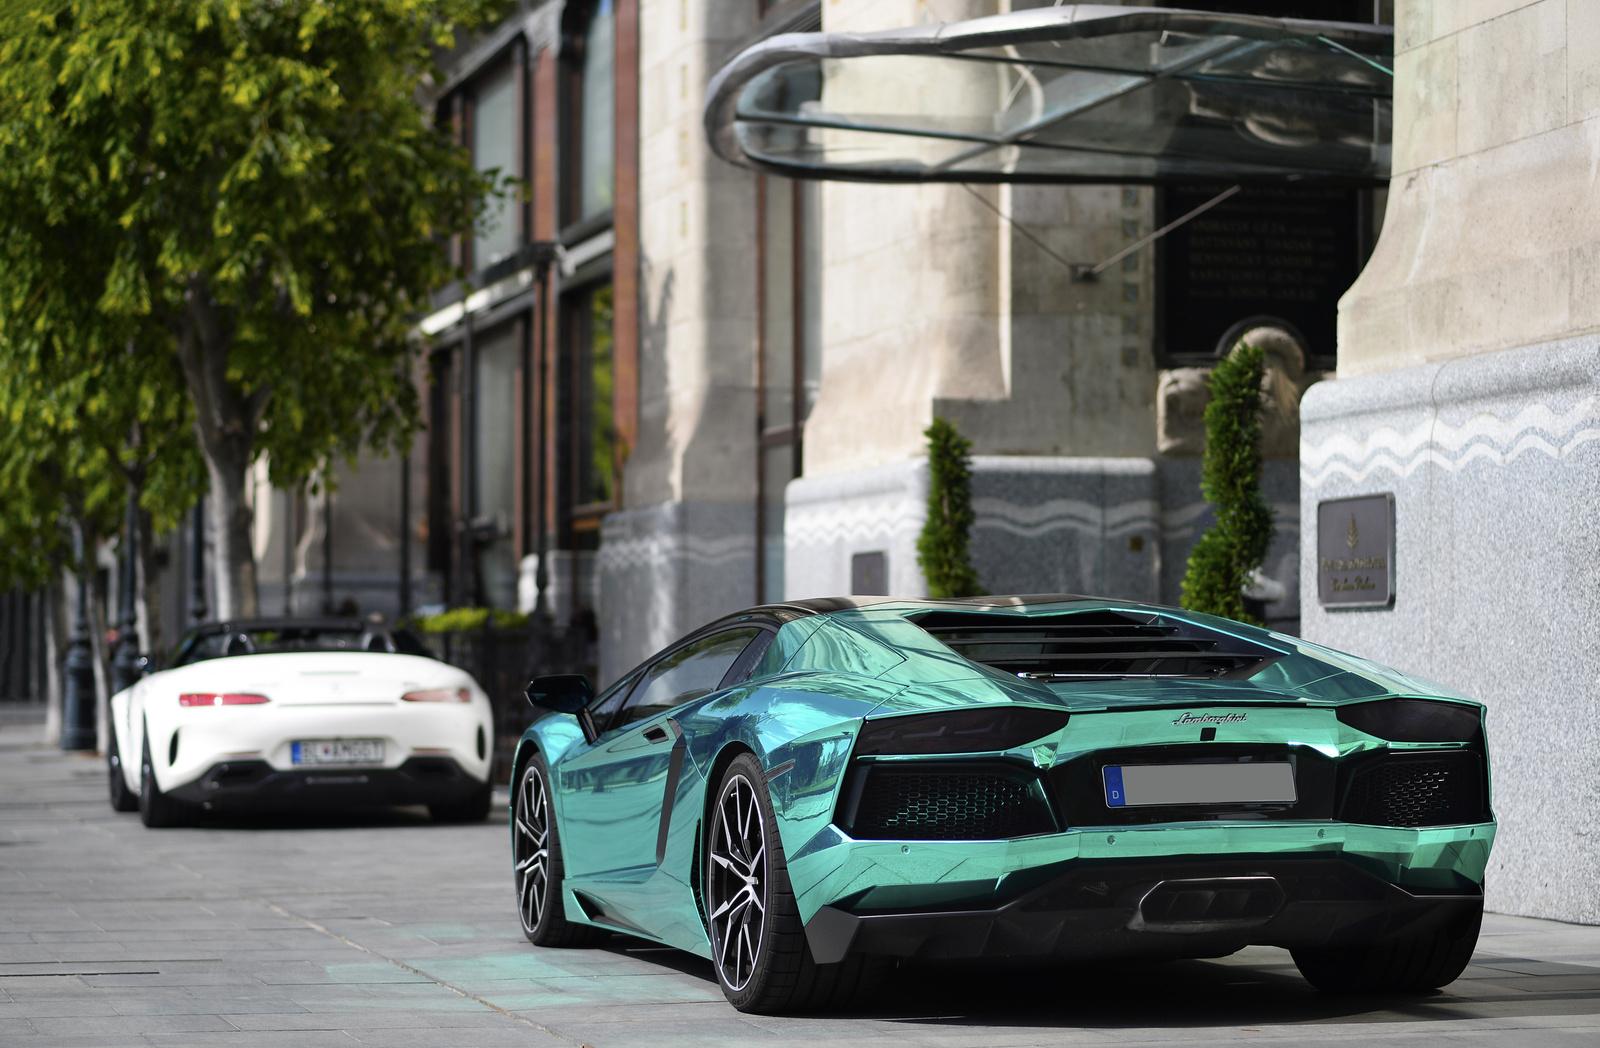 Mercedes AMG GT C Roadster - Lamborghini Aventador